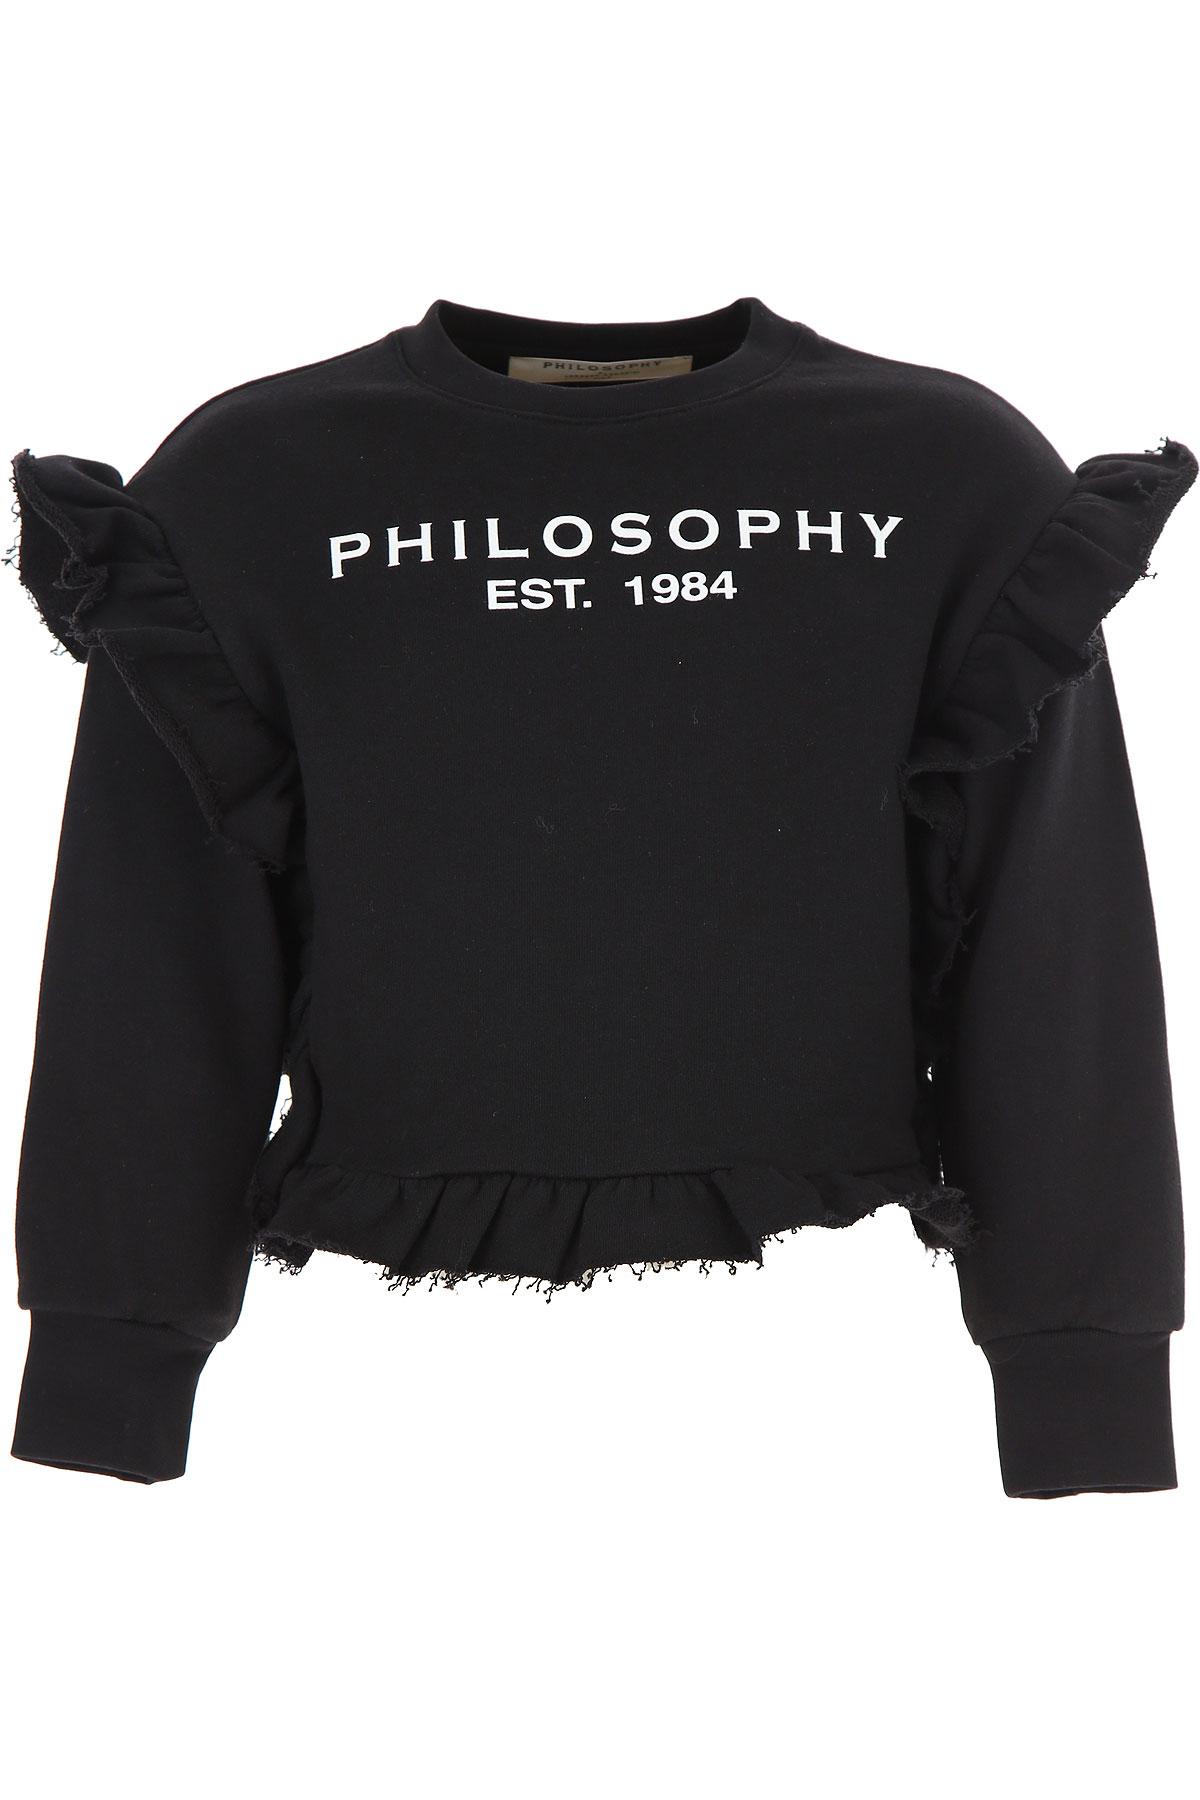 Philosophy di Lorenzo Serafini Kids Sweatshirts & Hoodies for Girls On Sale, Black, Cotton, 2019, 10Y 12Y 6Y 8Y